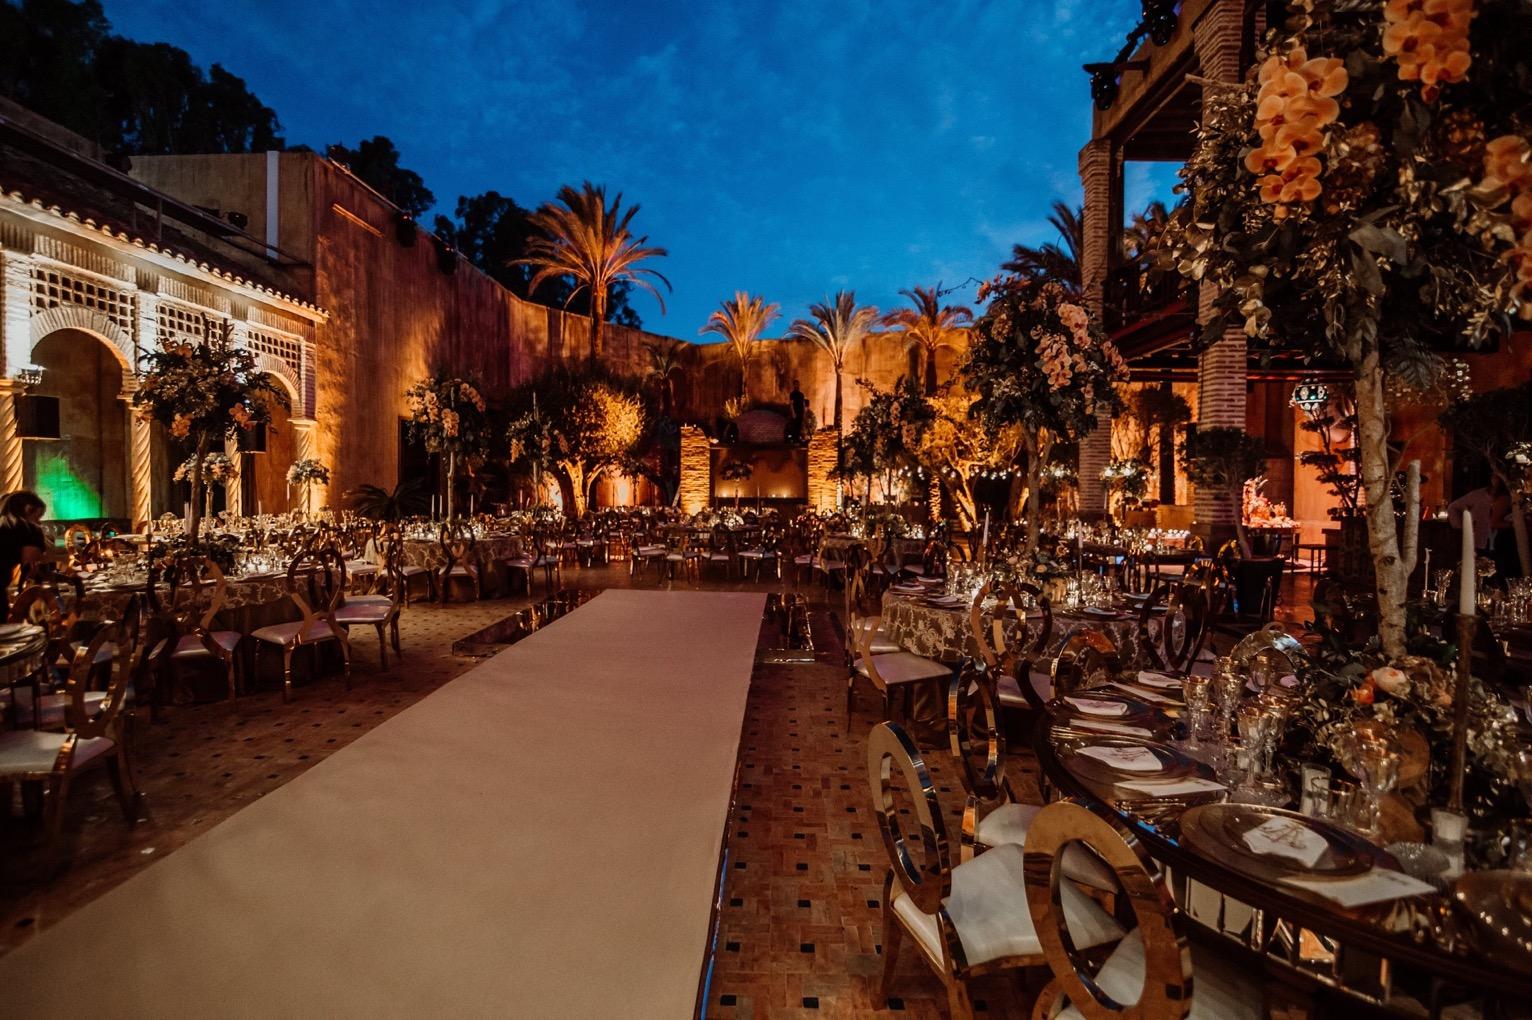 Si-Quiero-Wedding-Planner-By-Sira-Antequera-Bodas-Málaga-Marbella-Miami- L-A-16